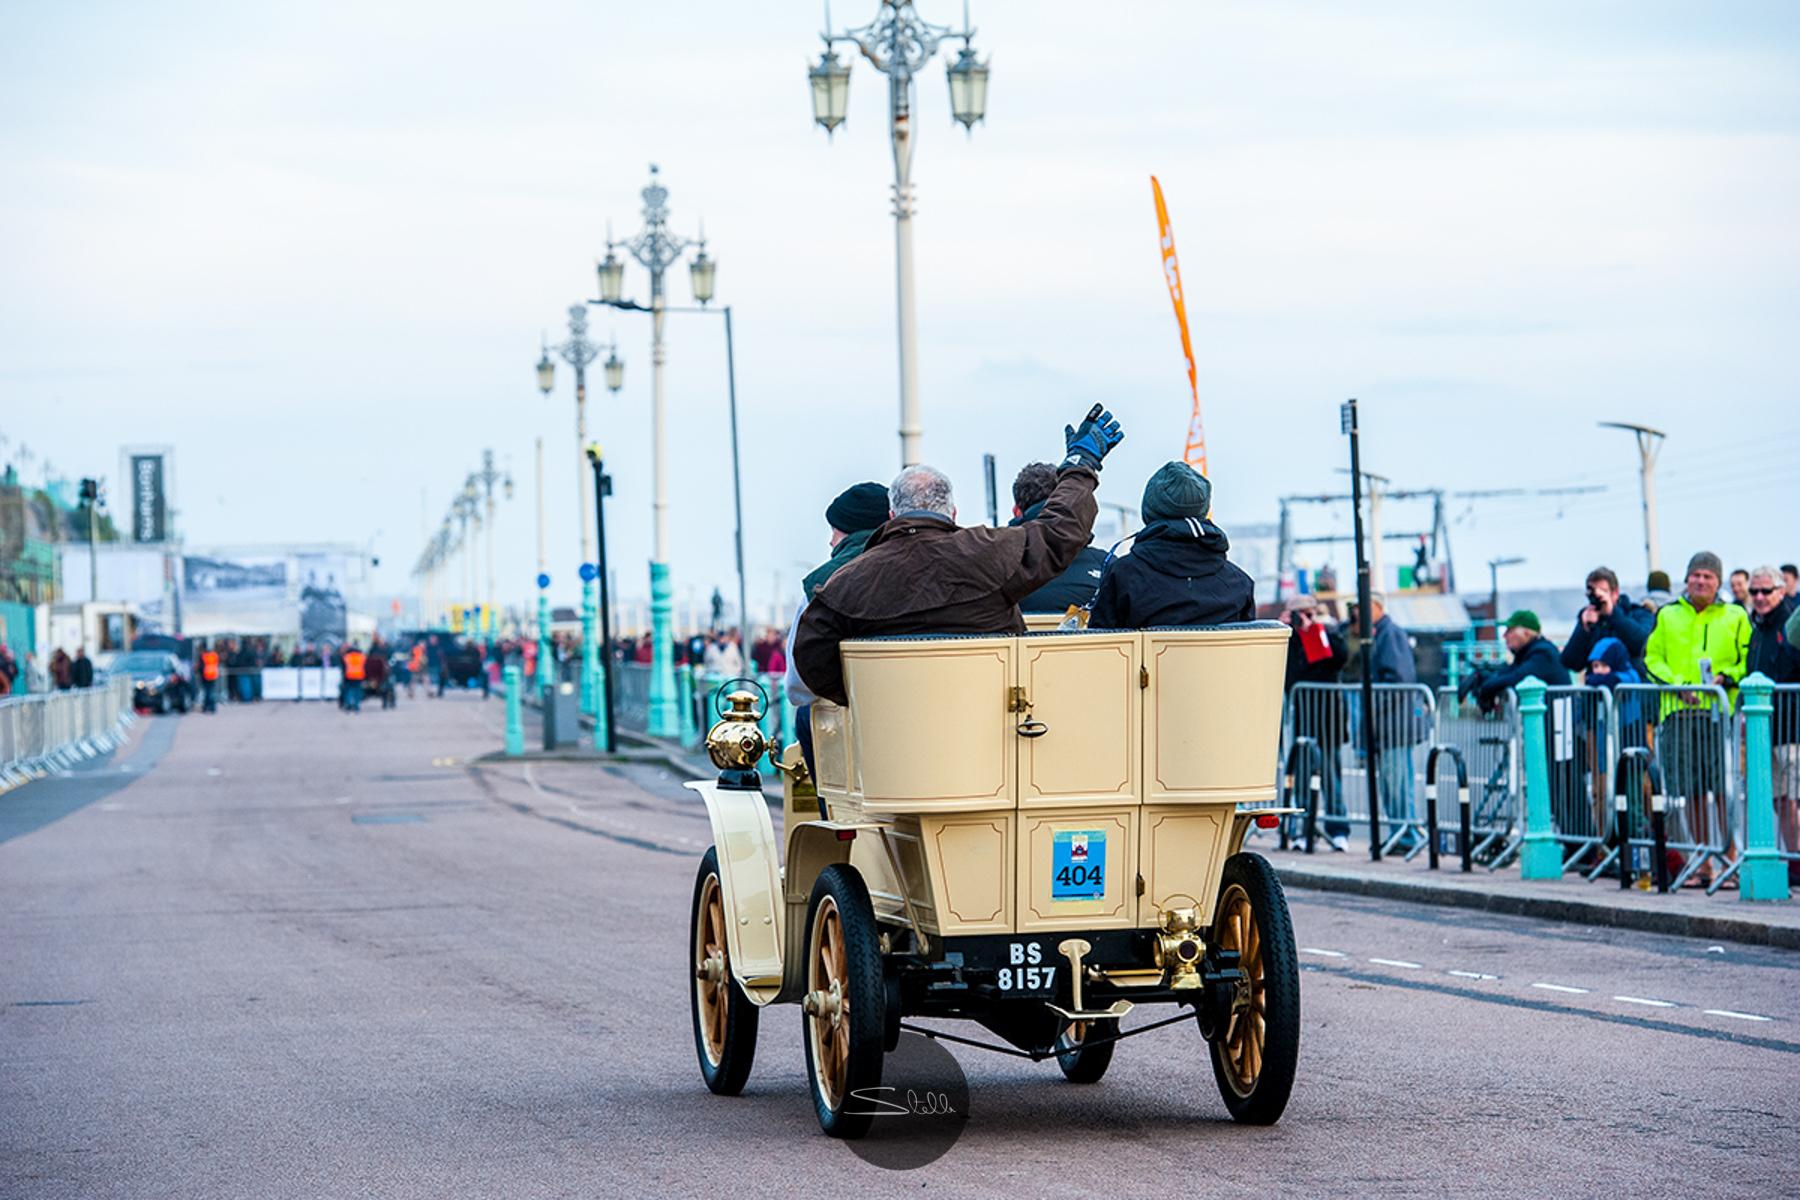 Graham Horder driving a 1903 Darracq 1 Cylinder 8 HP looking resplendent.